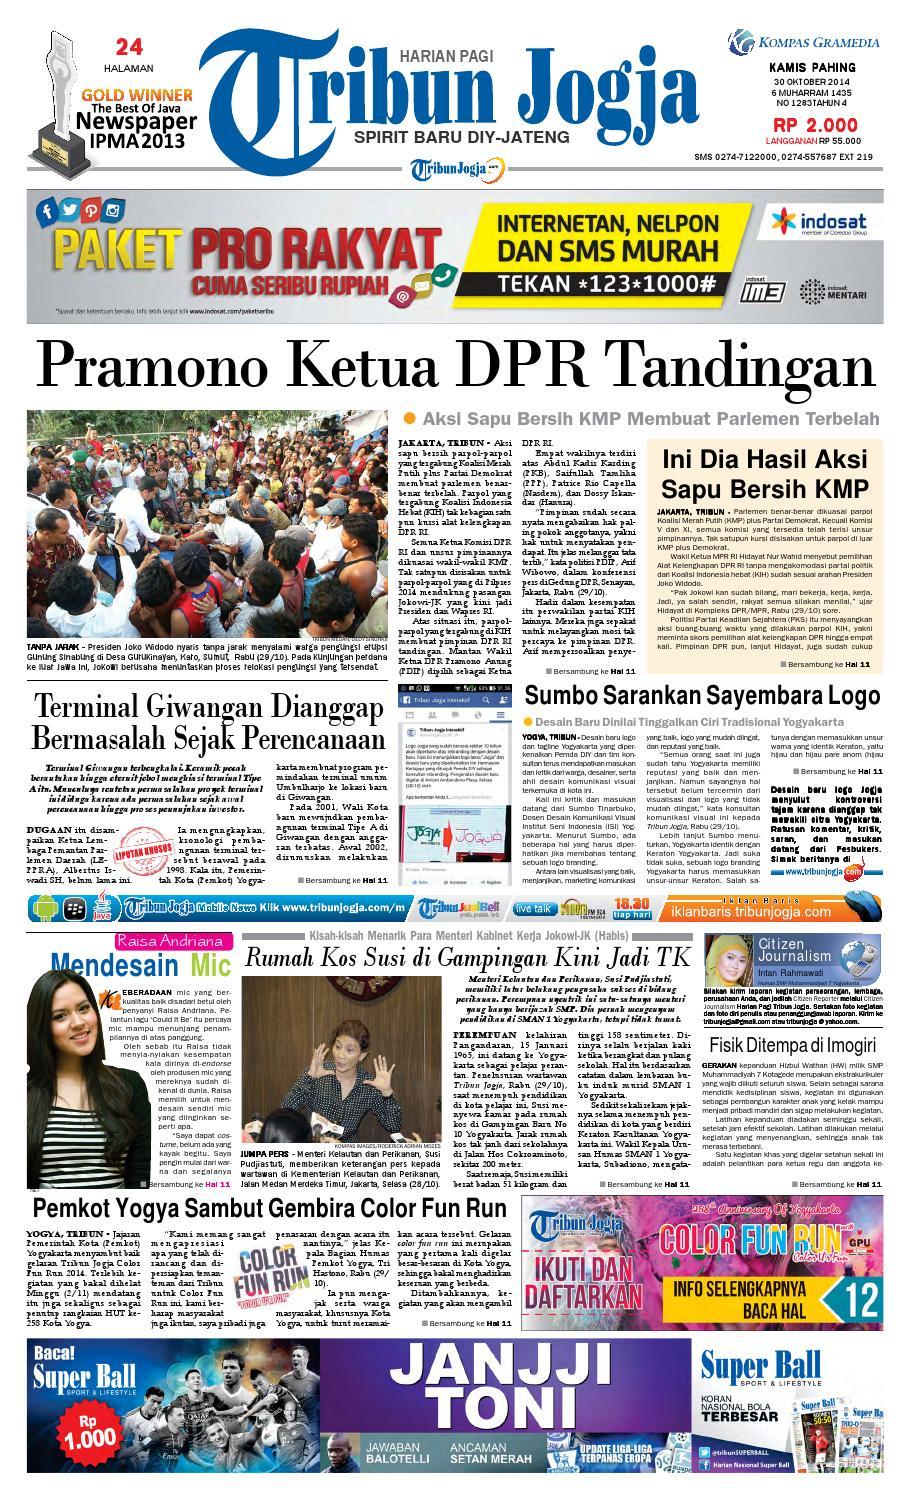 Tribunjogja 30 10 2014 By Tribun Jogja Issuu Produk Ukm Bumn Dat Edwina Bali Orange Slip On